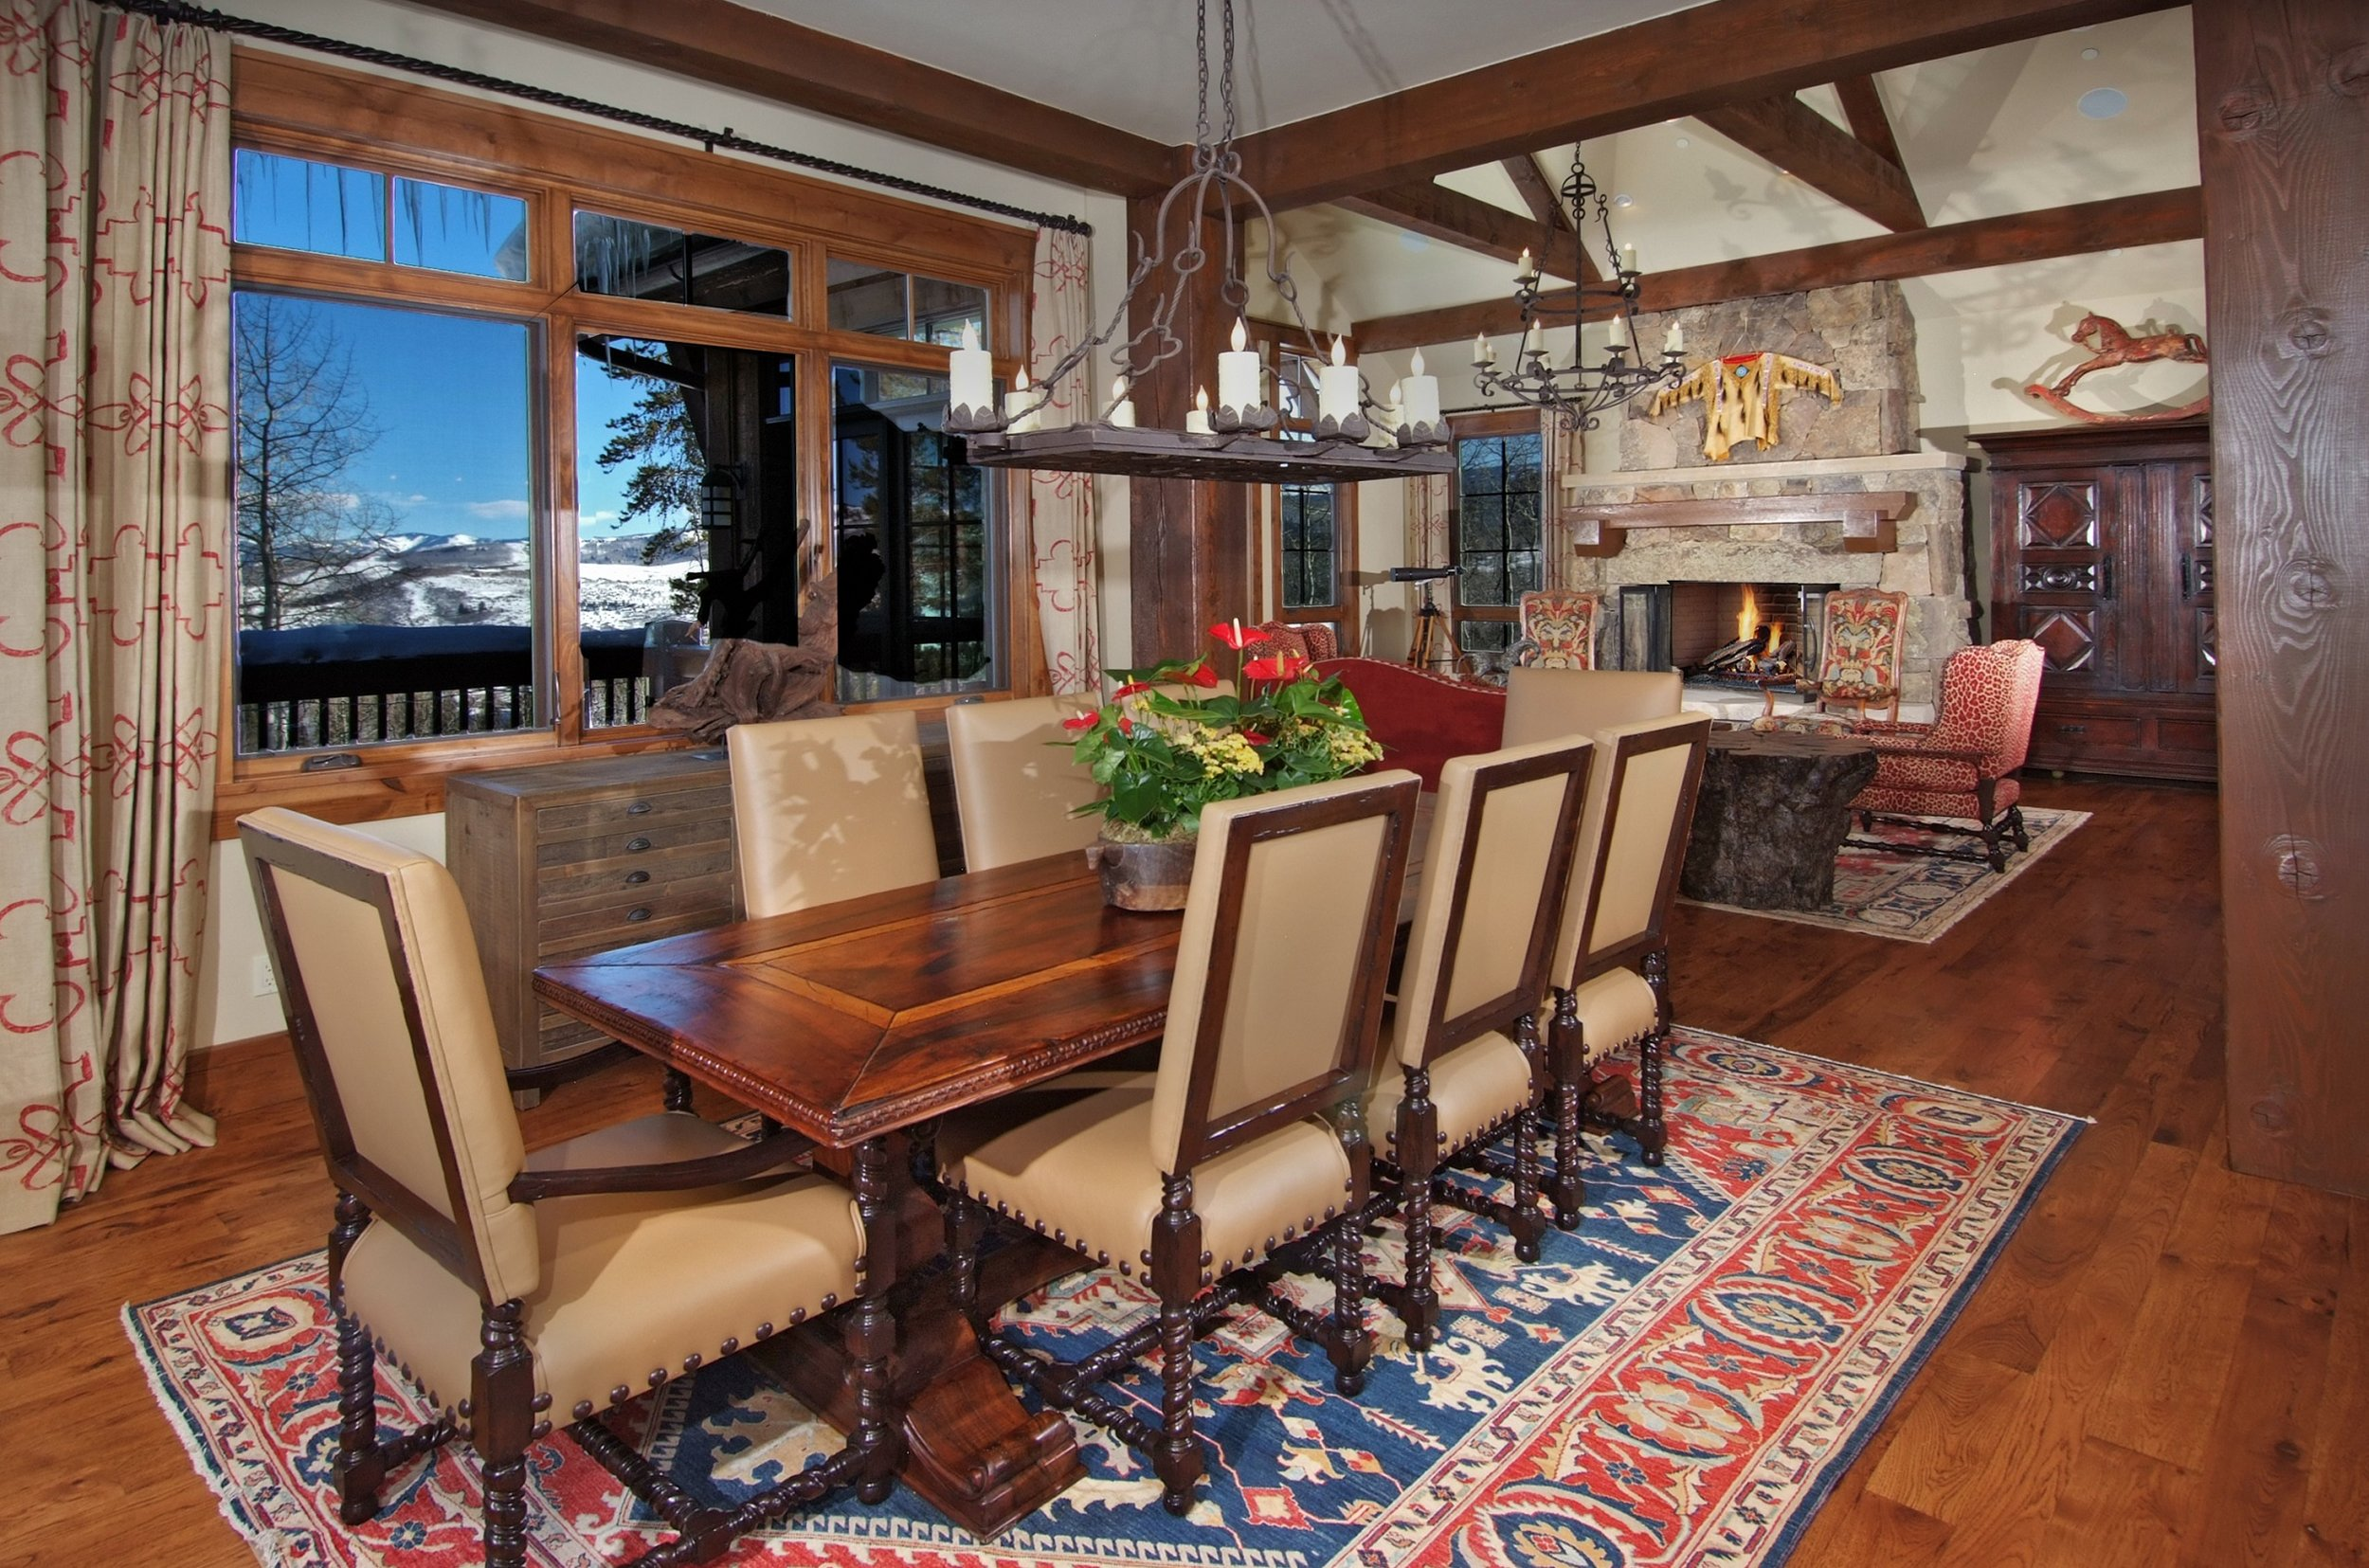 Colorado Dining Living Space – Award Winning